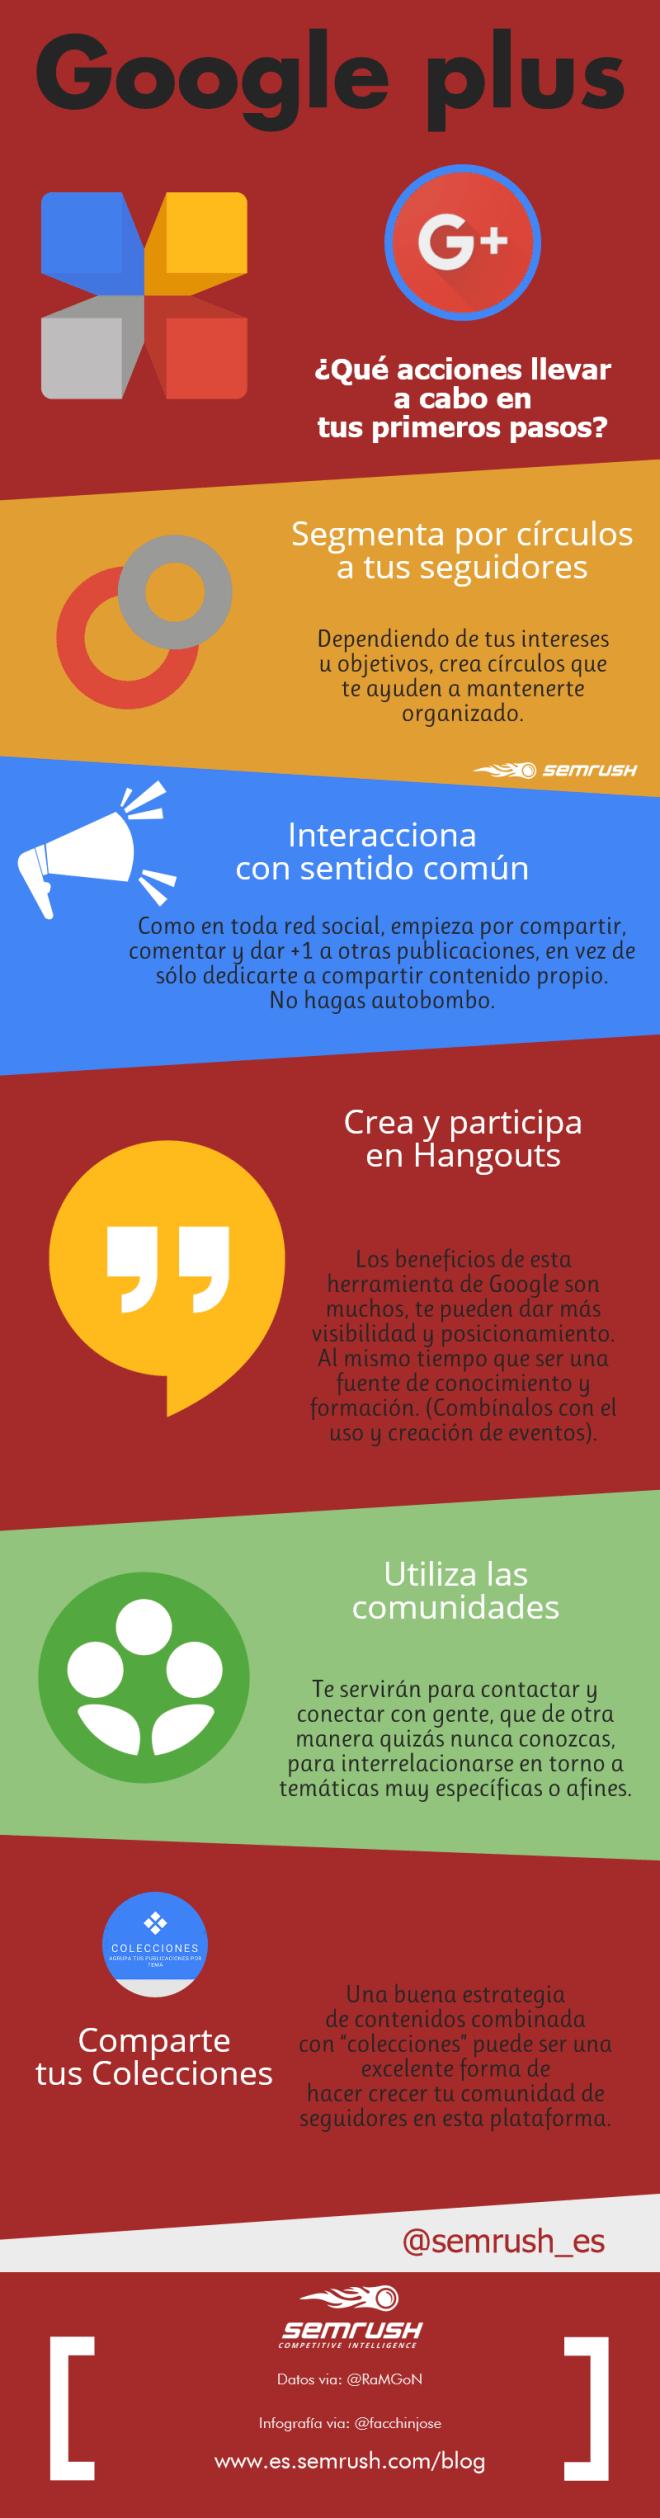 Algunos consejos para usar Google +